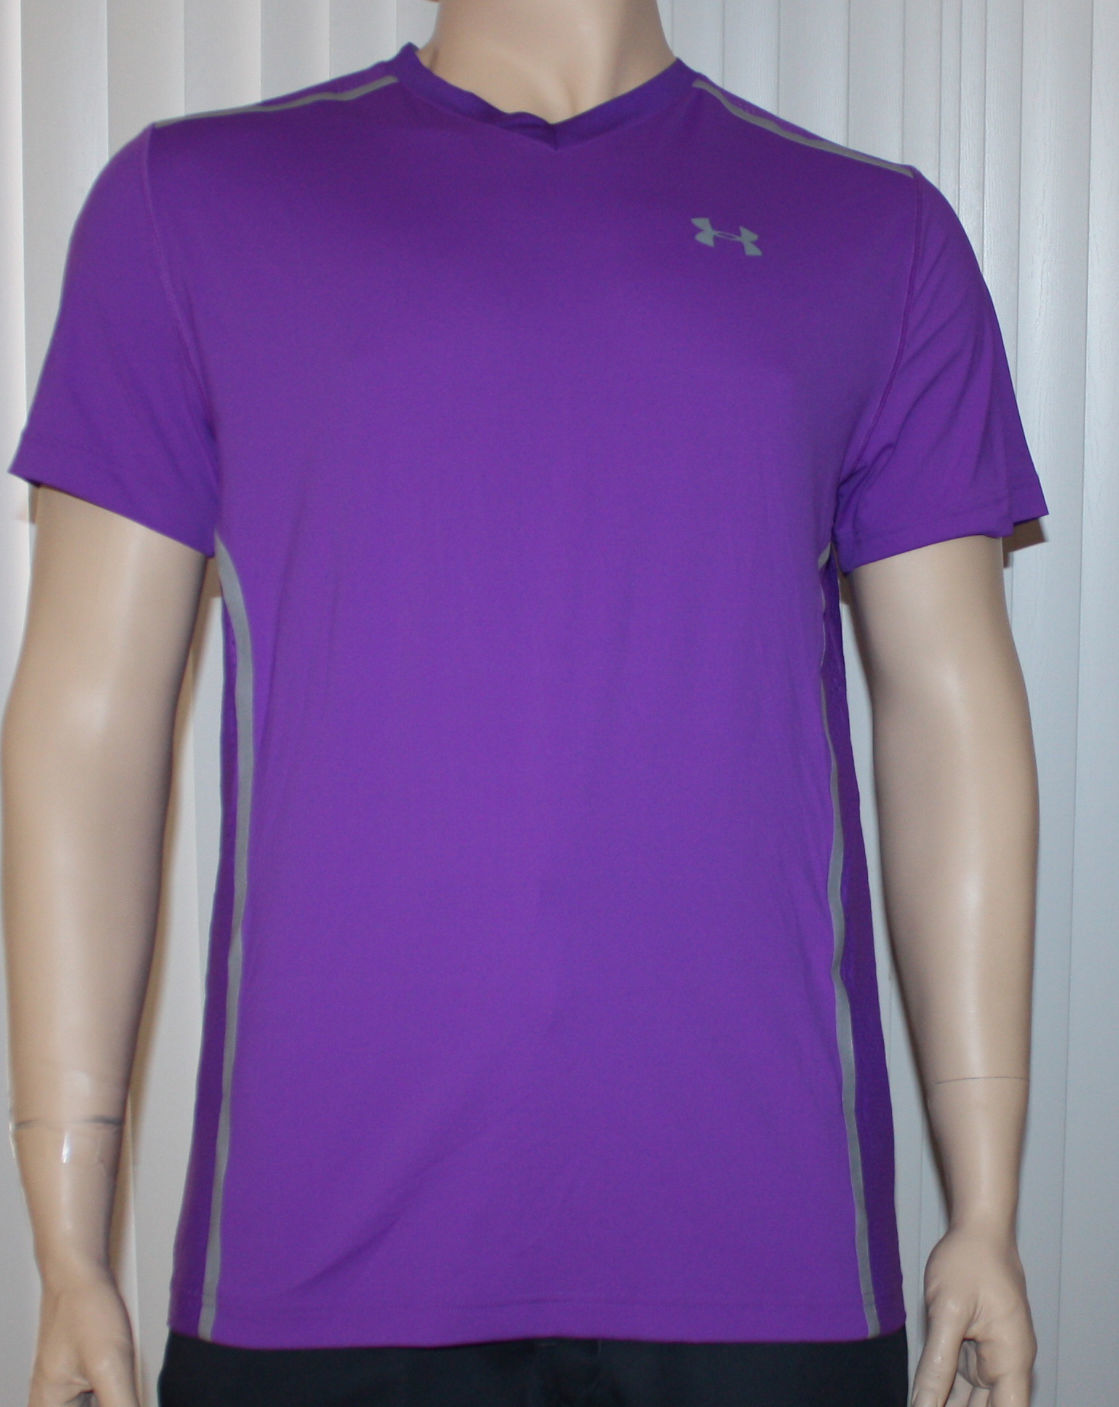 Under Armour VENT UA HeatGear Men's Purple Pride Fitted Shirt -Large 09872